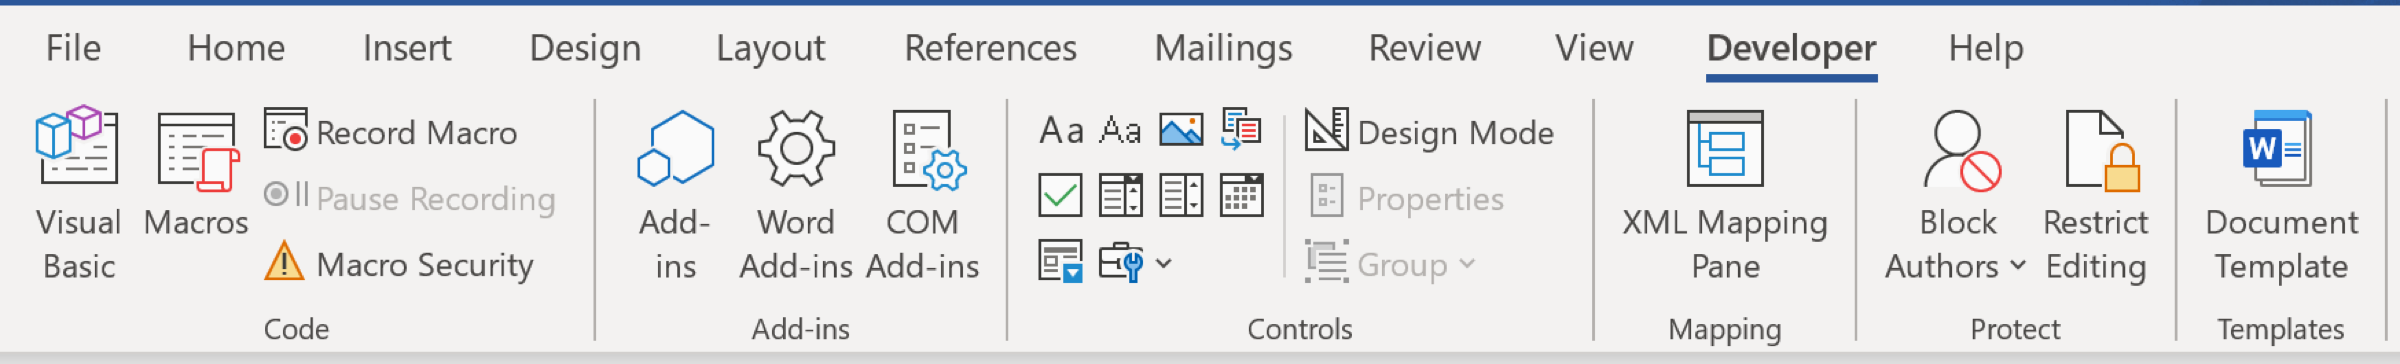 Onglet Microsoft Word Développeur actif